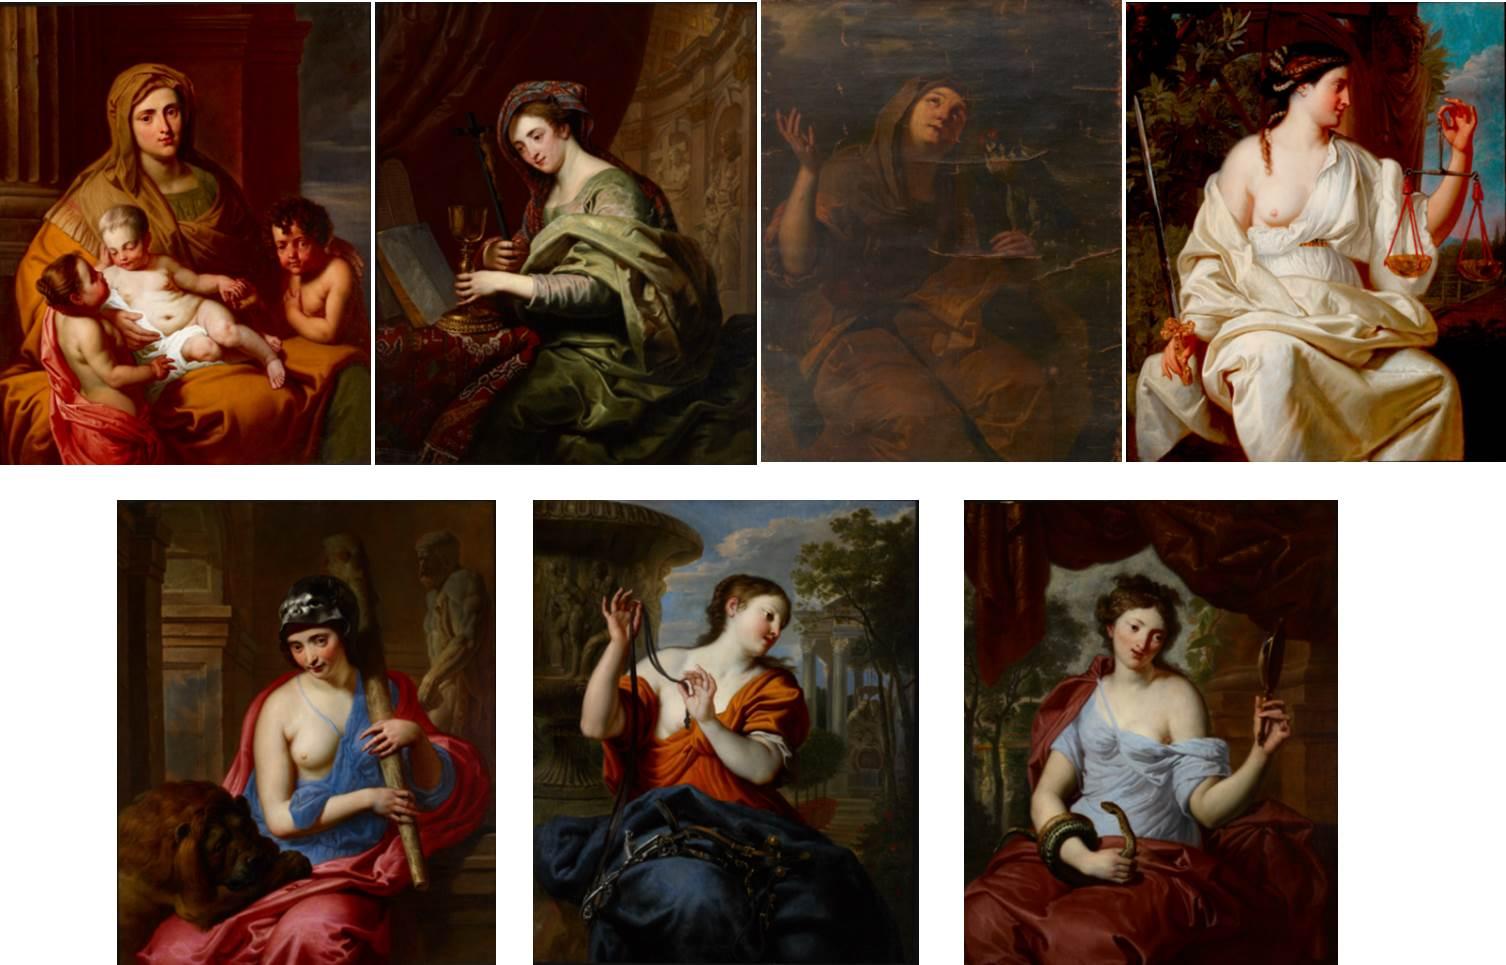 Erasmus Quellinus II and Workshop, The Seven Virtues, c. 1650-60, oil on canvas. © Ashmolean Museum, University of Oxford